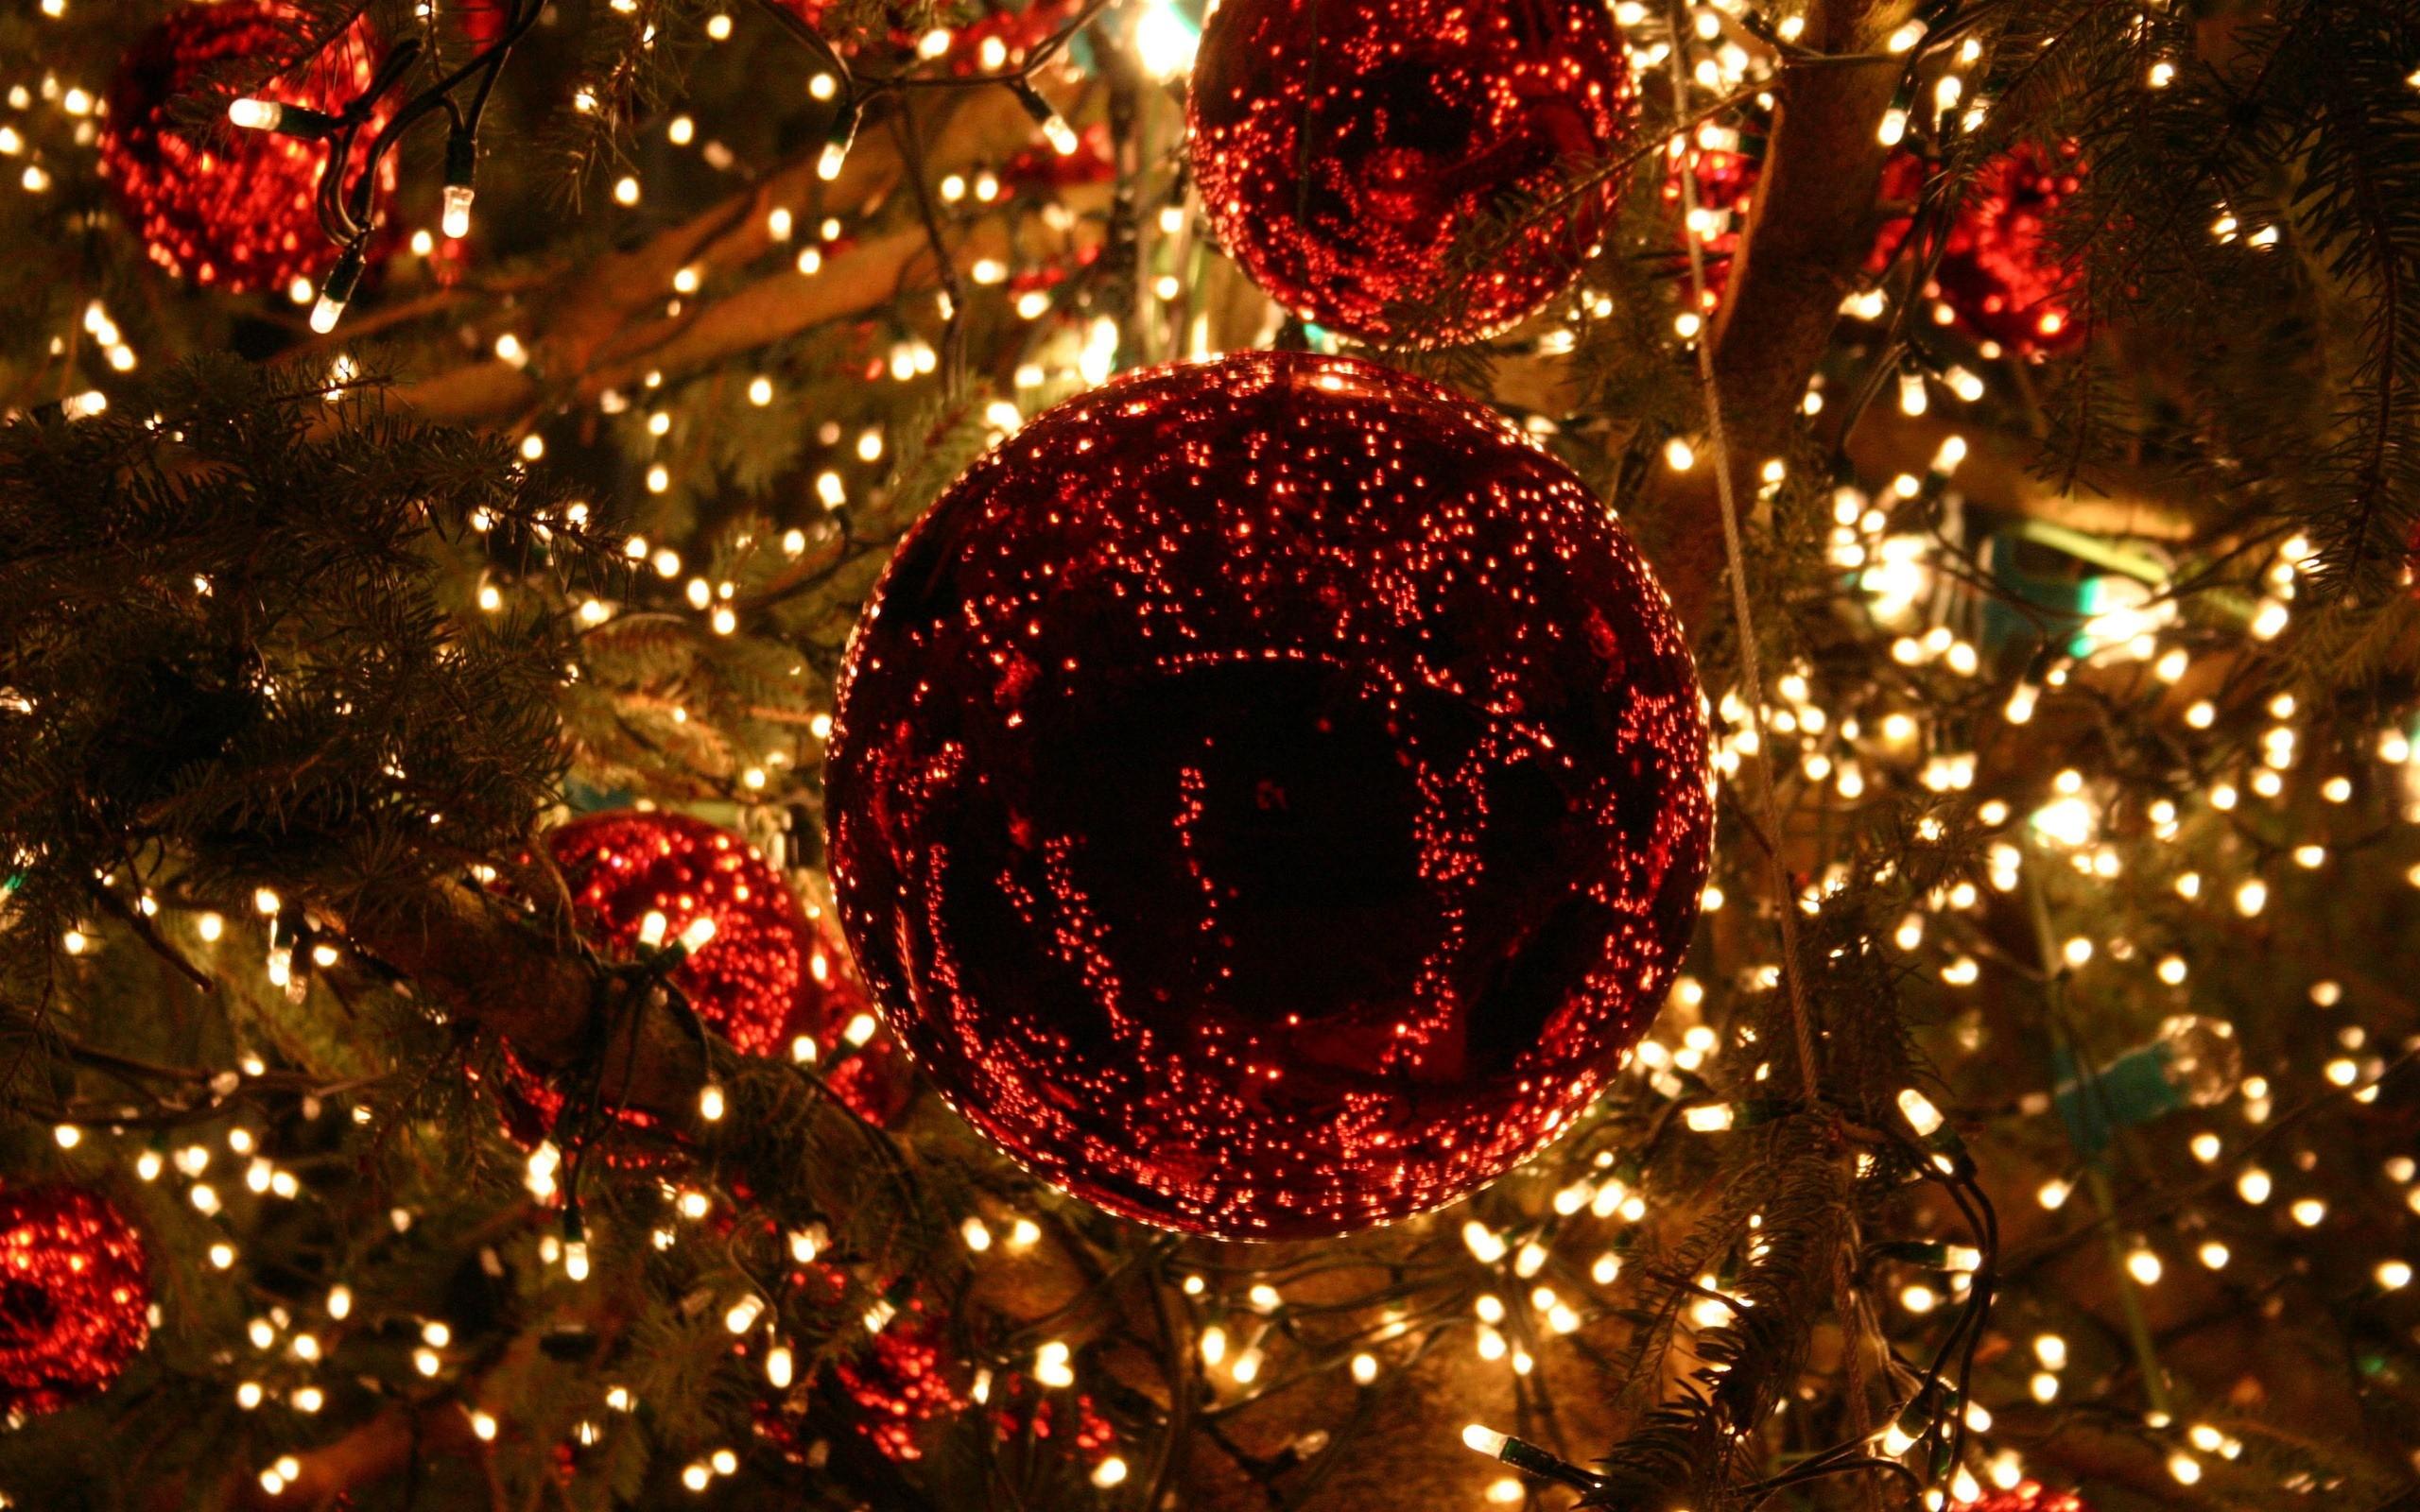 Religious Christmas Backgrounds Free.Religious Christmas Wallpaper Christmas Backgrounds 49 Images